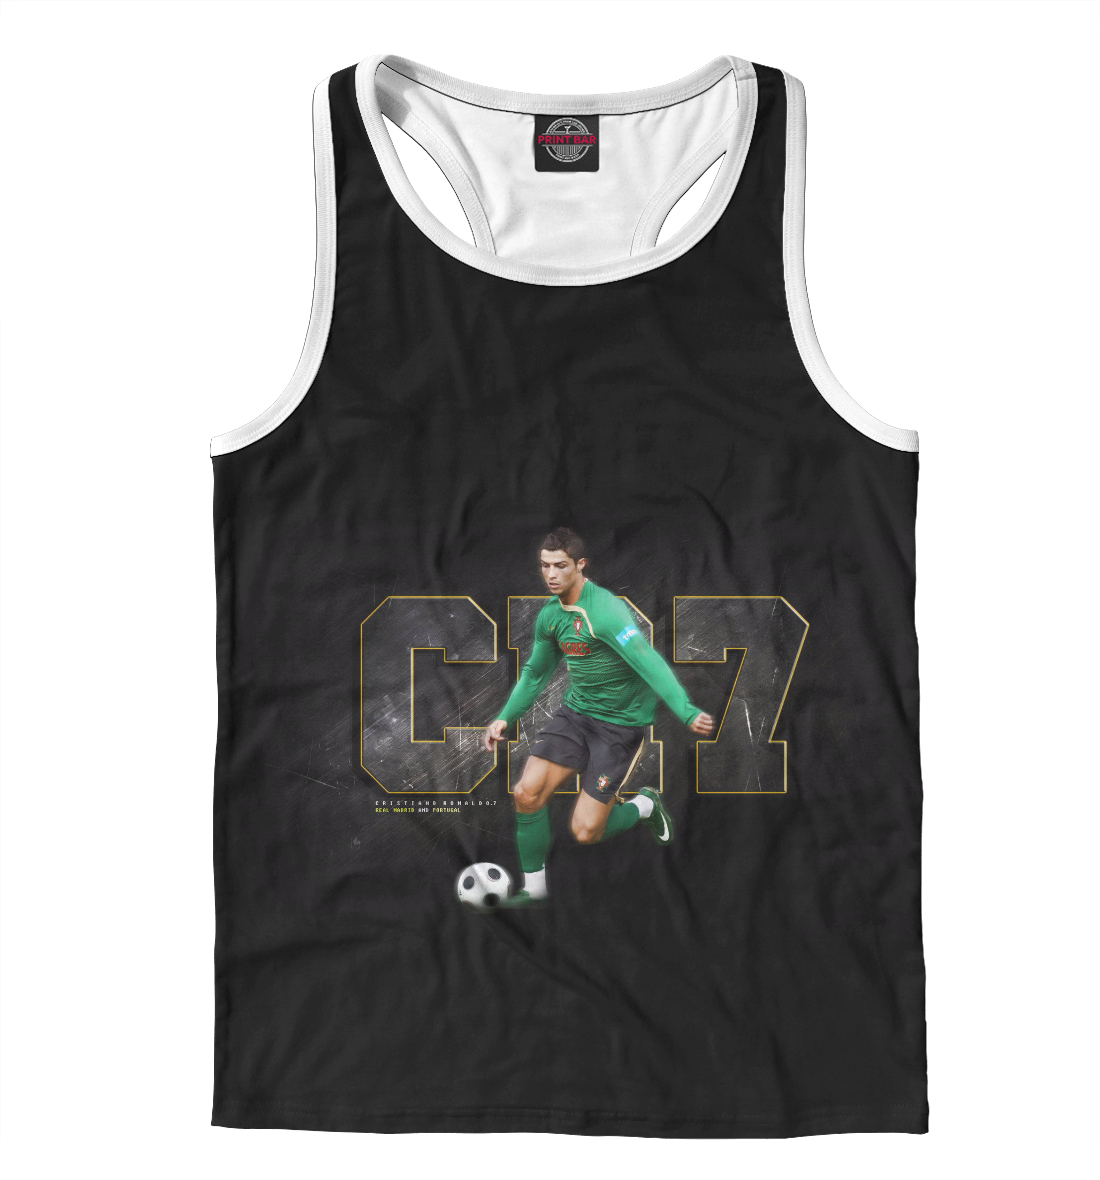 Купить Cristiano Ronaldo, Printbar, Майки борцовки, REA-775763-mayb-2